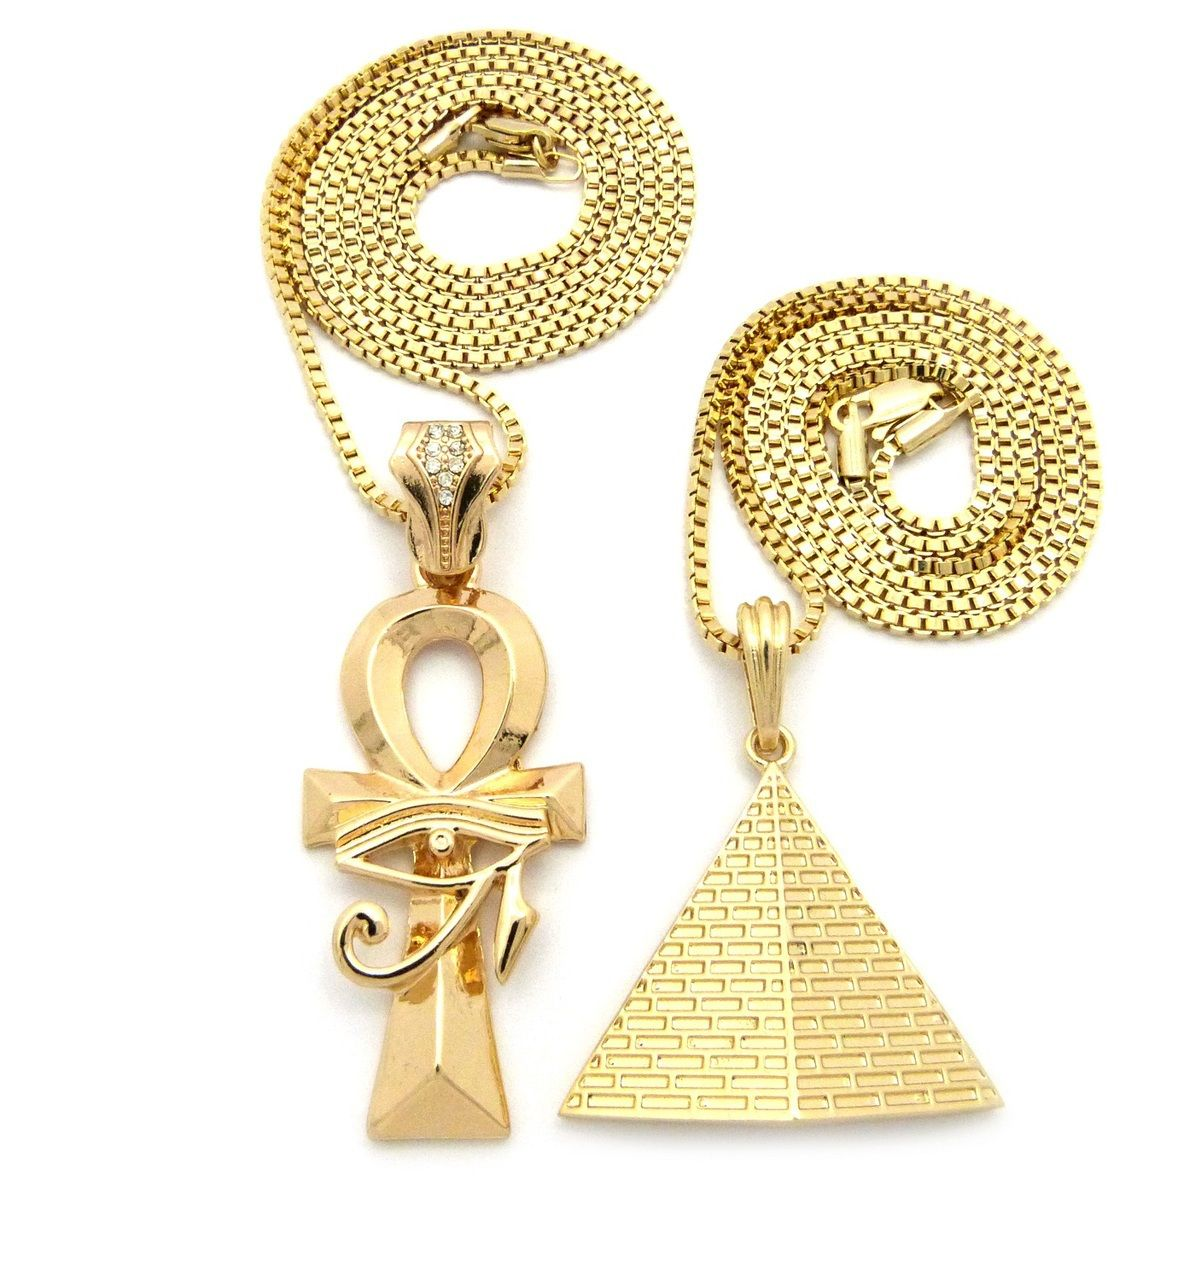 Eye of horus ankh cross pyramid of giza hip hop pendant chain eye of horus ankh cross pyramid of giza hip hop pendant chain bling jewelz buycottarizona Image collections